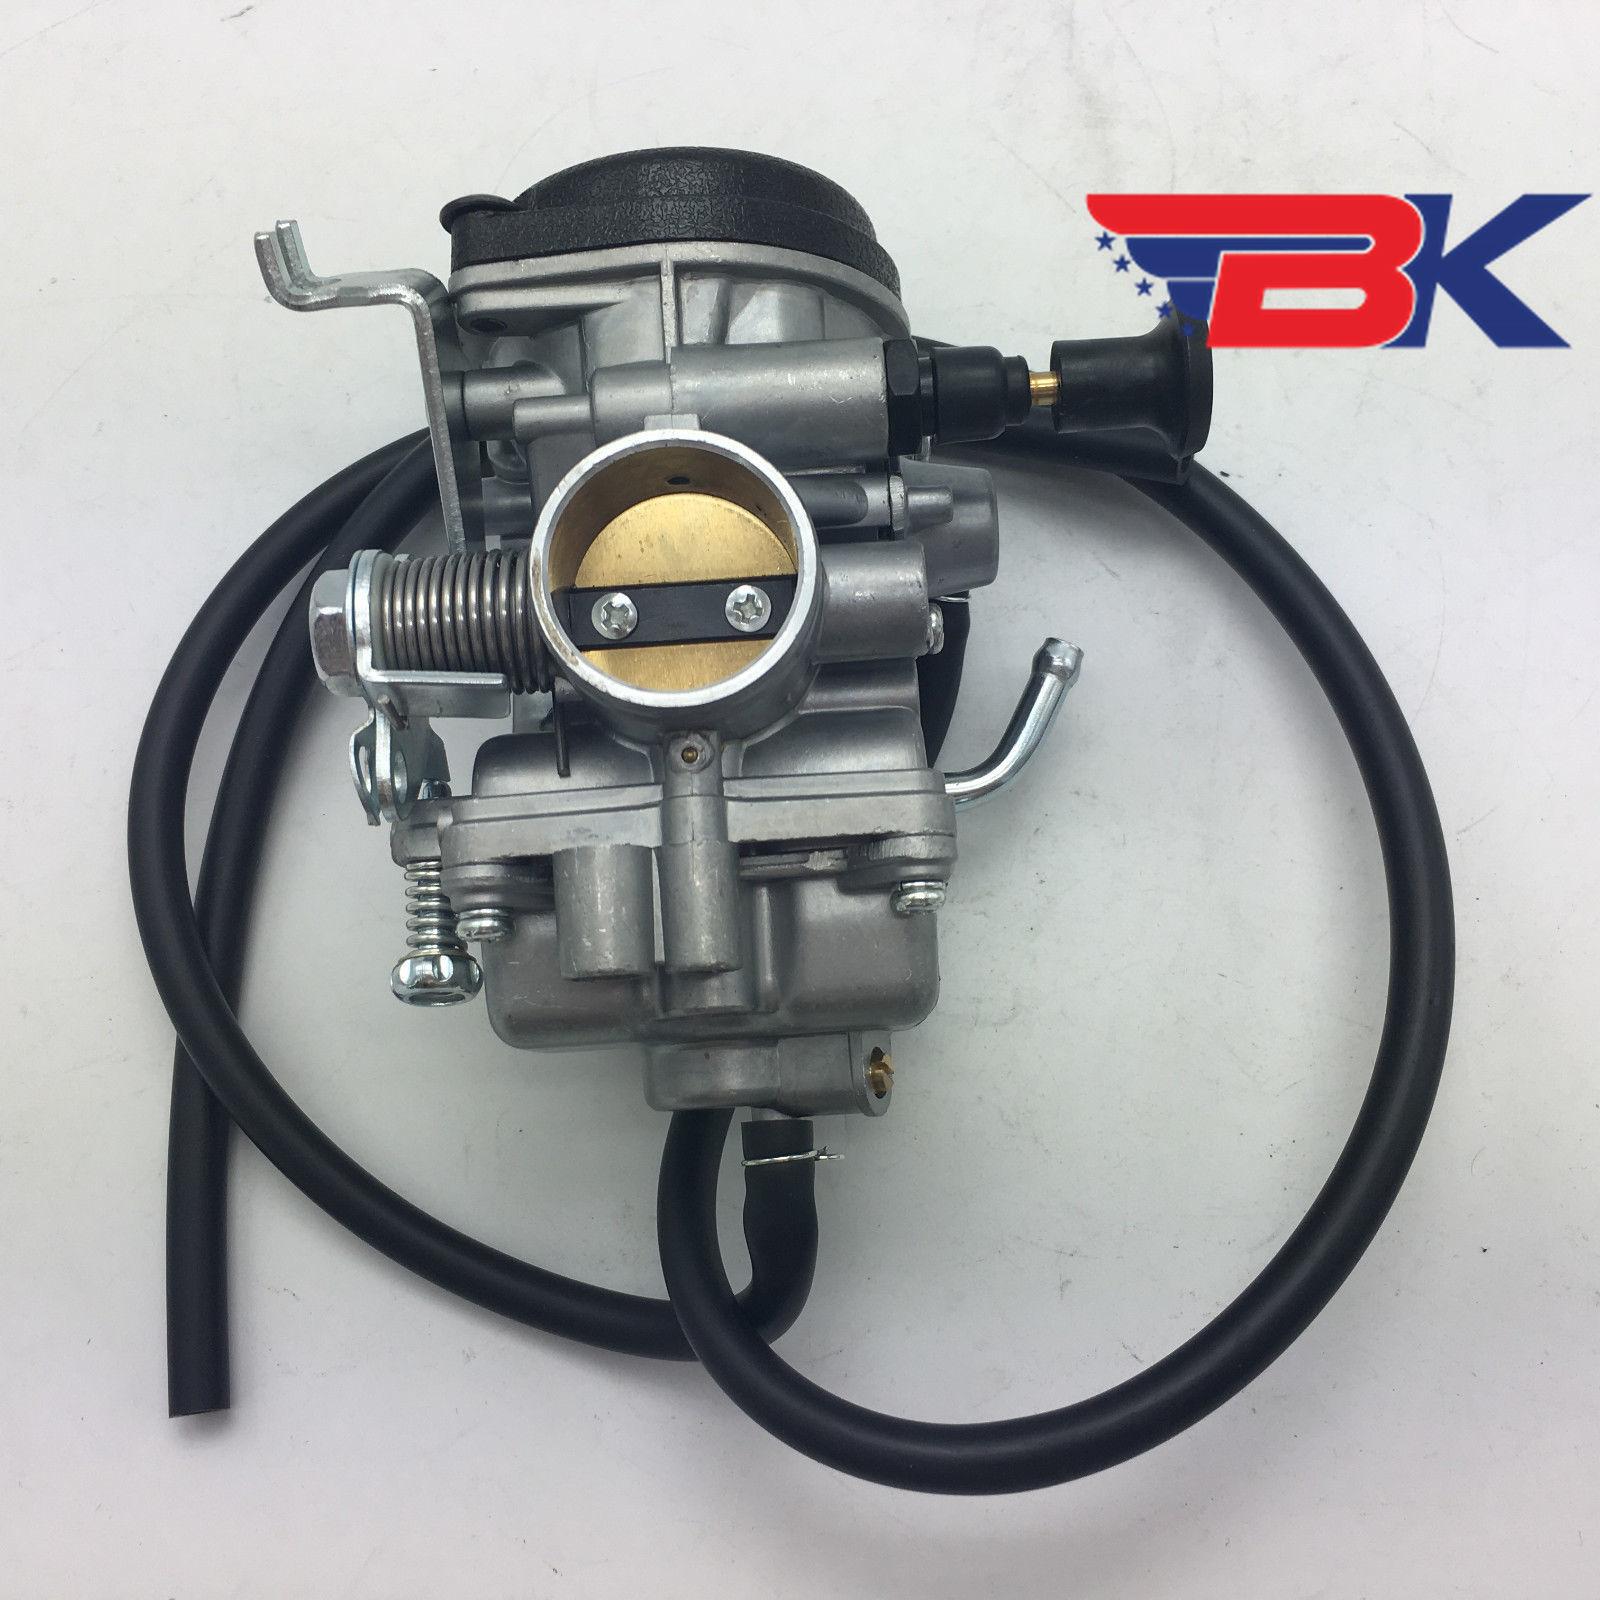 Automobiles & Motorcycles Carburettor For Jianshe 125 Yamaha Ybr125 Gs125 En125 125cc Motorcycle Atv Carb Soft And Light